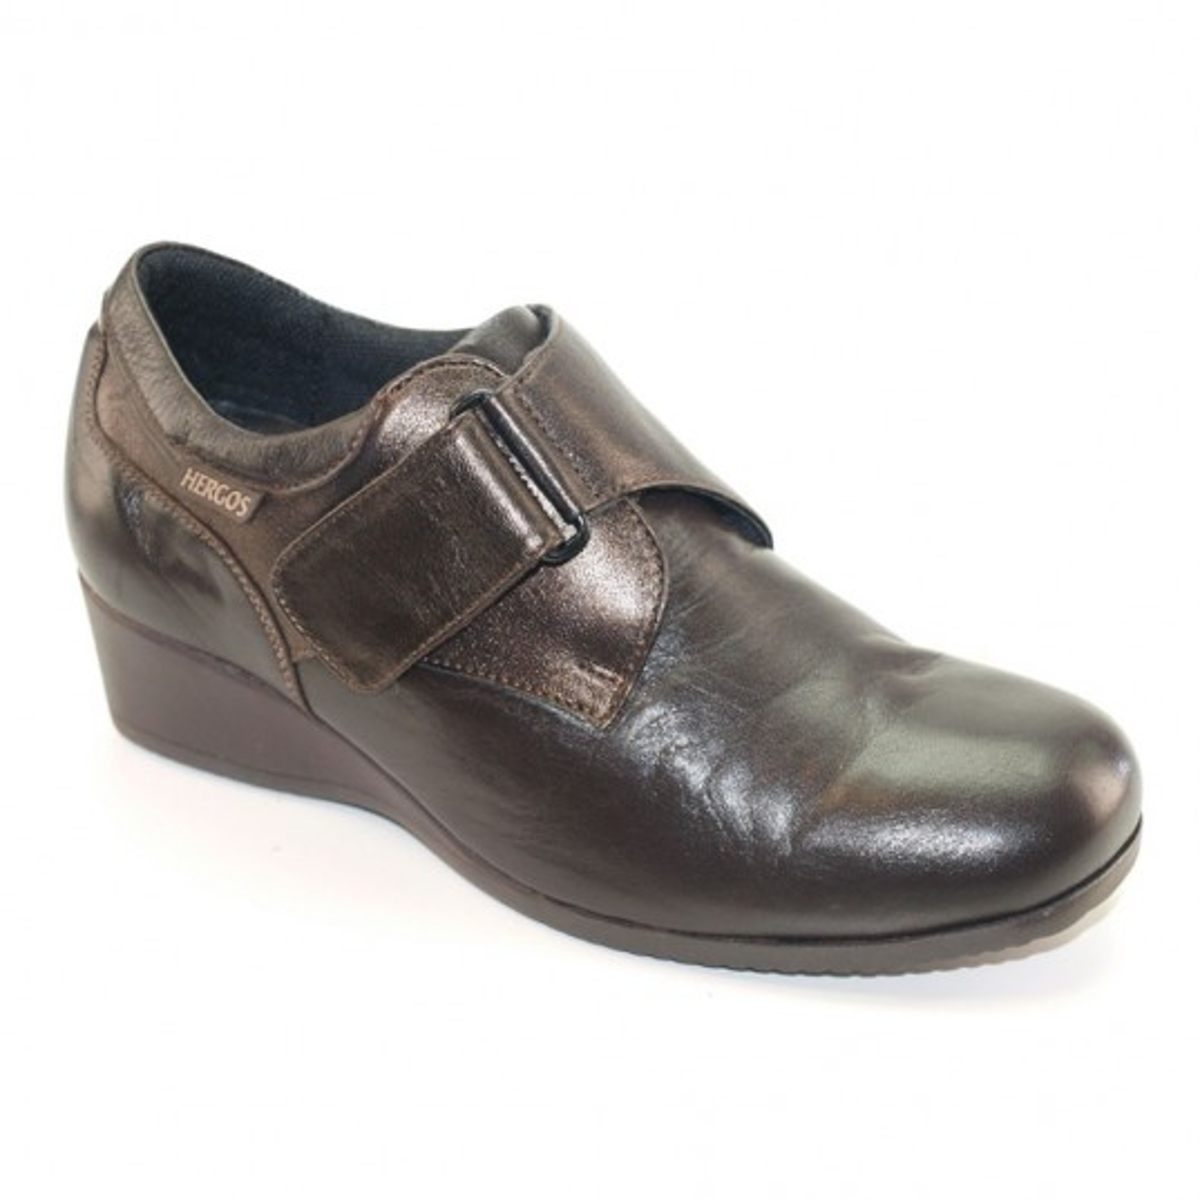 H 9001 Testa di Moro Laminato - Scarpa comoda ed elegante - Vera pelle